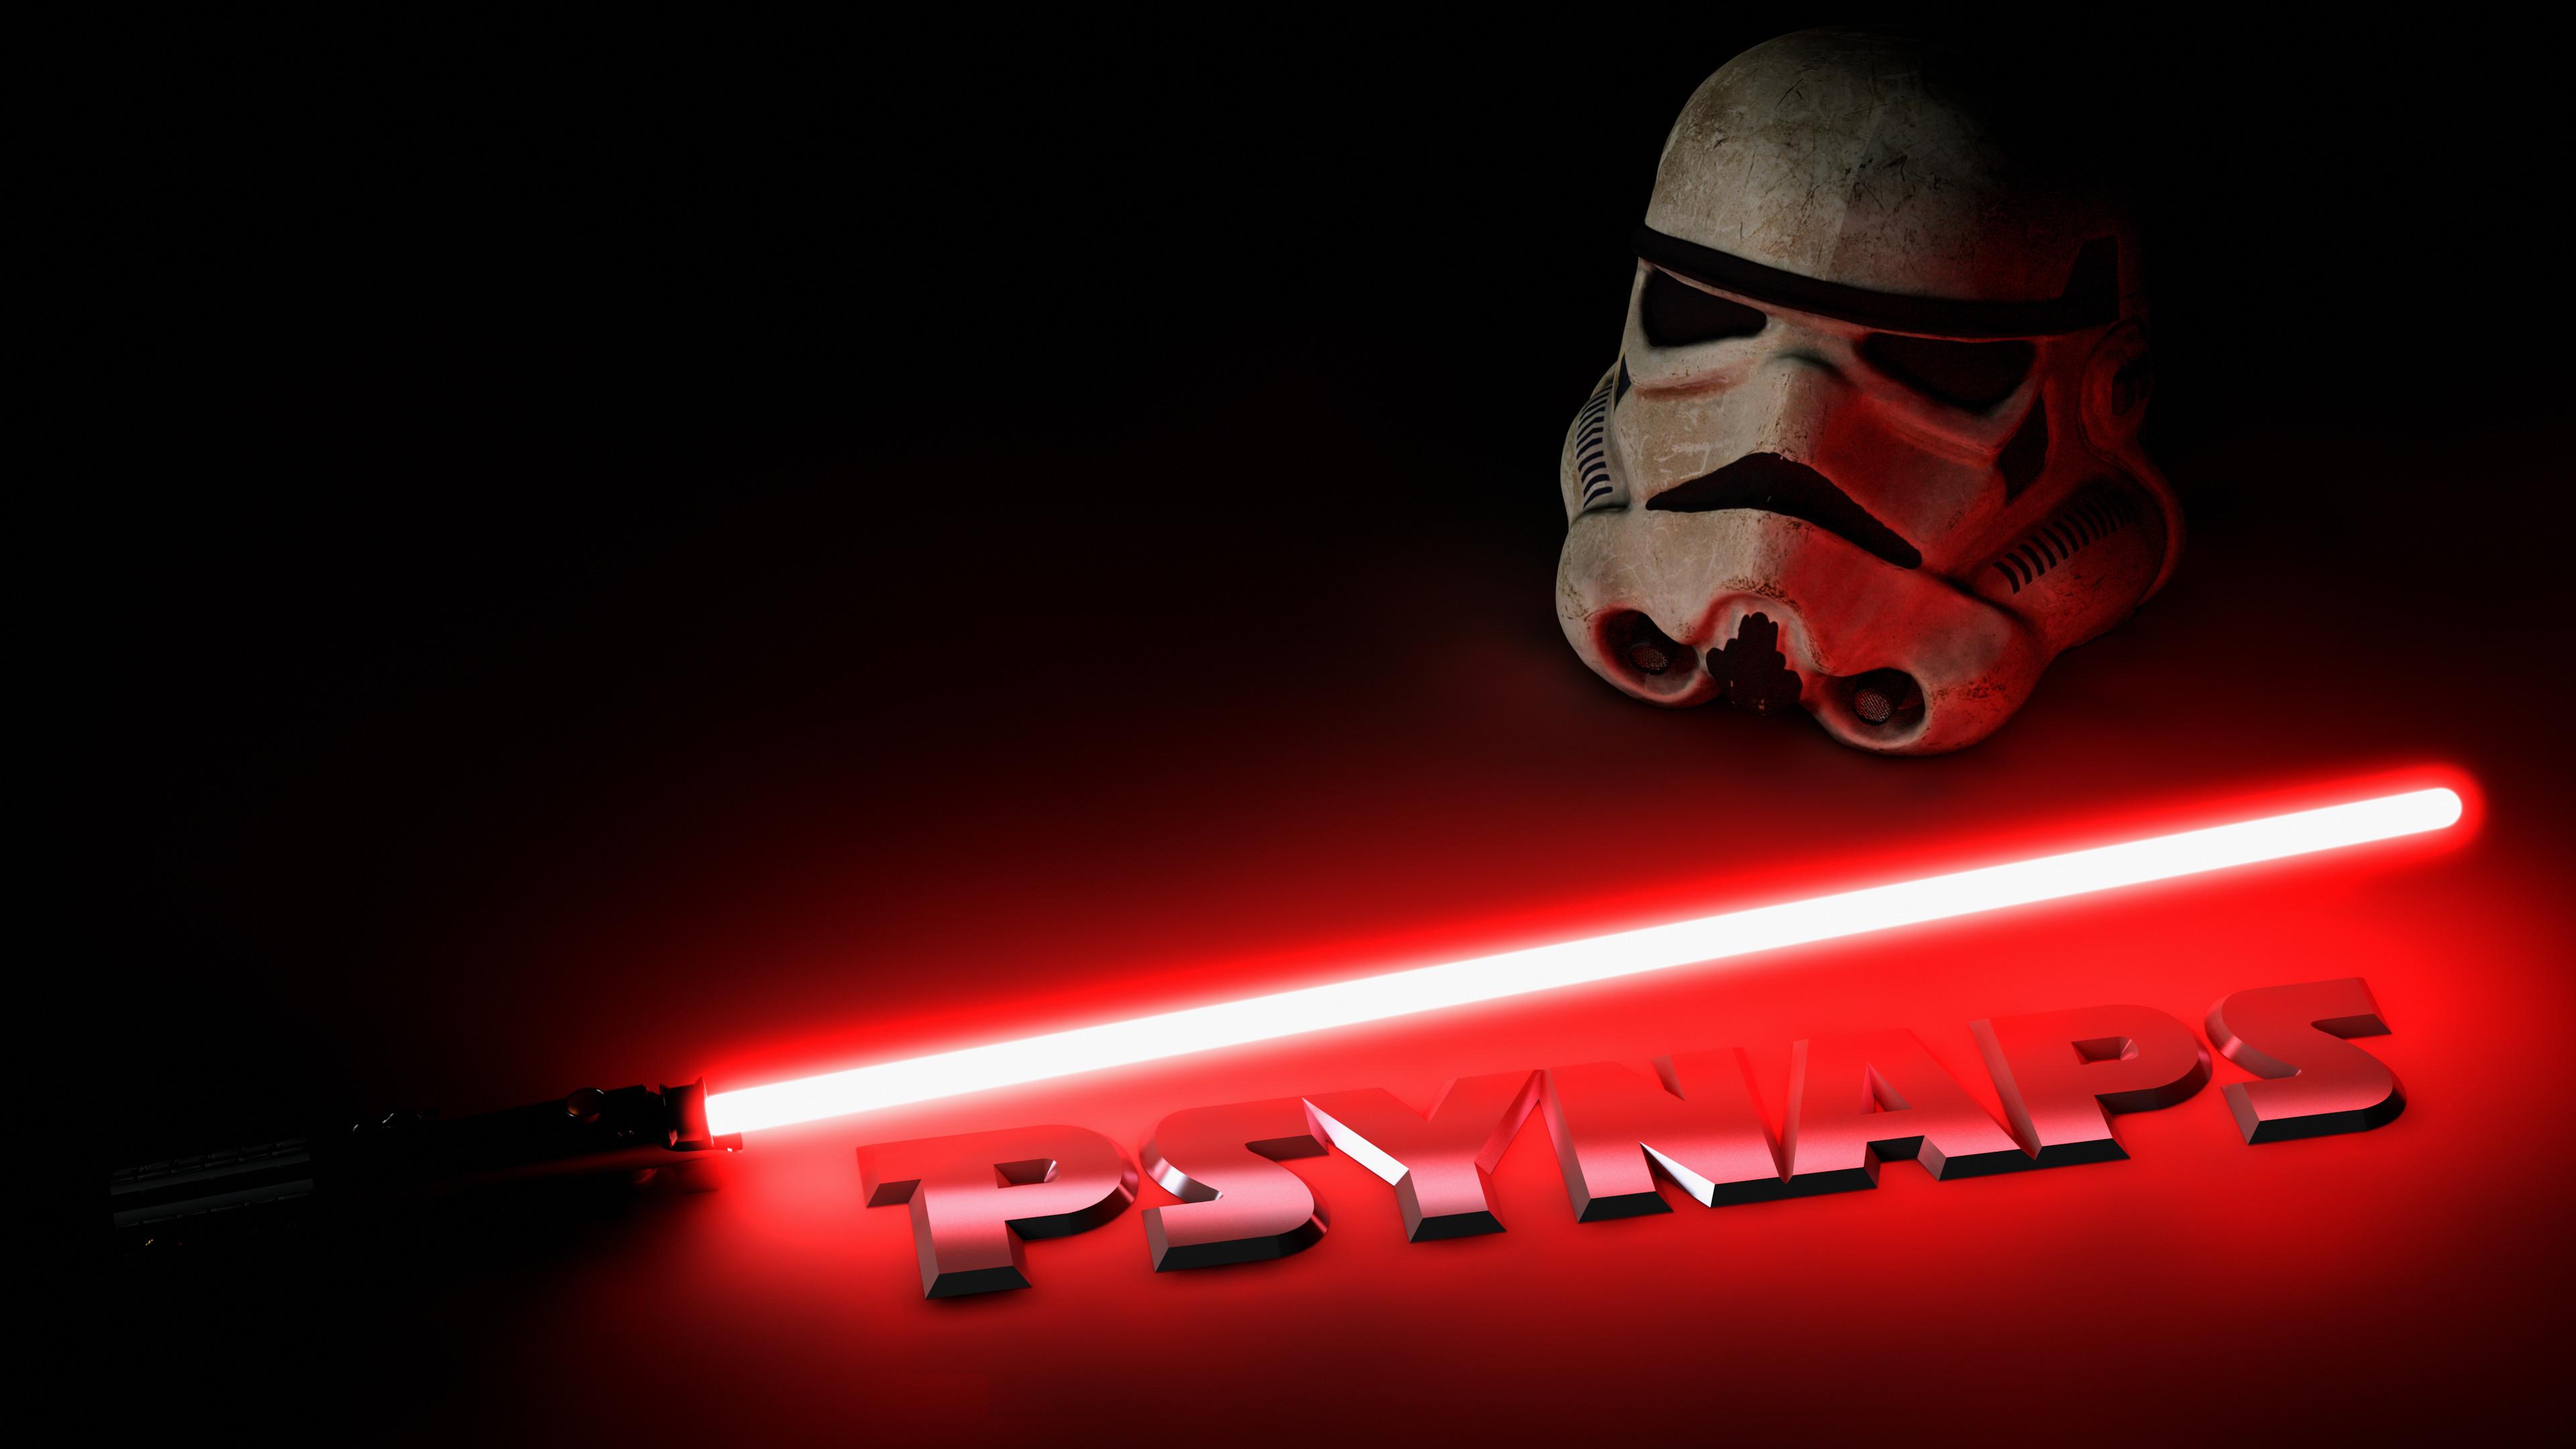 Star Wars Light Saber & Storm Trooper 4K Custom Wallpaper